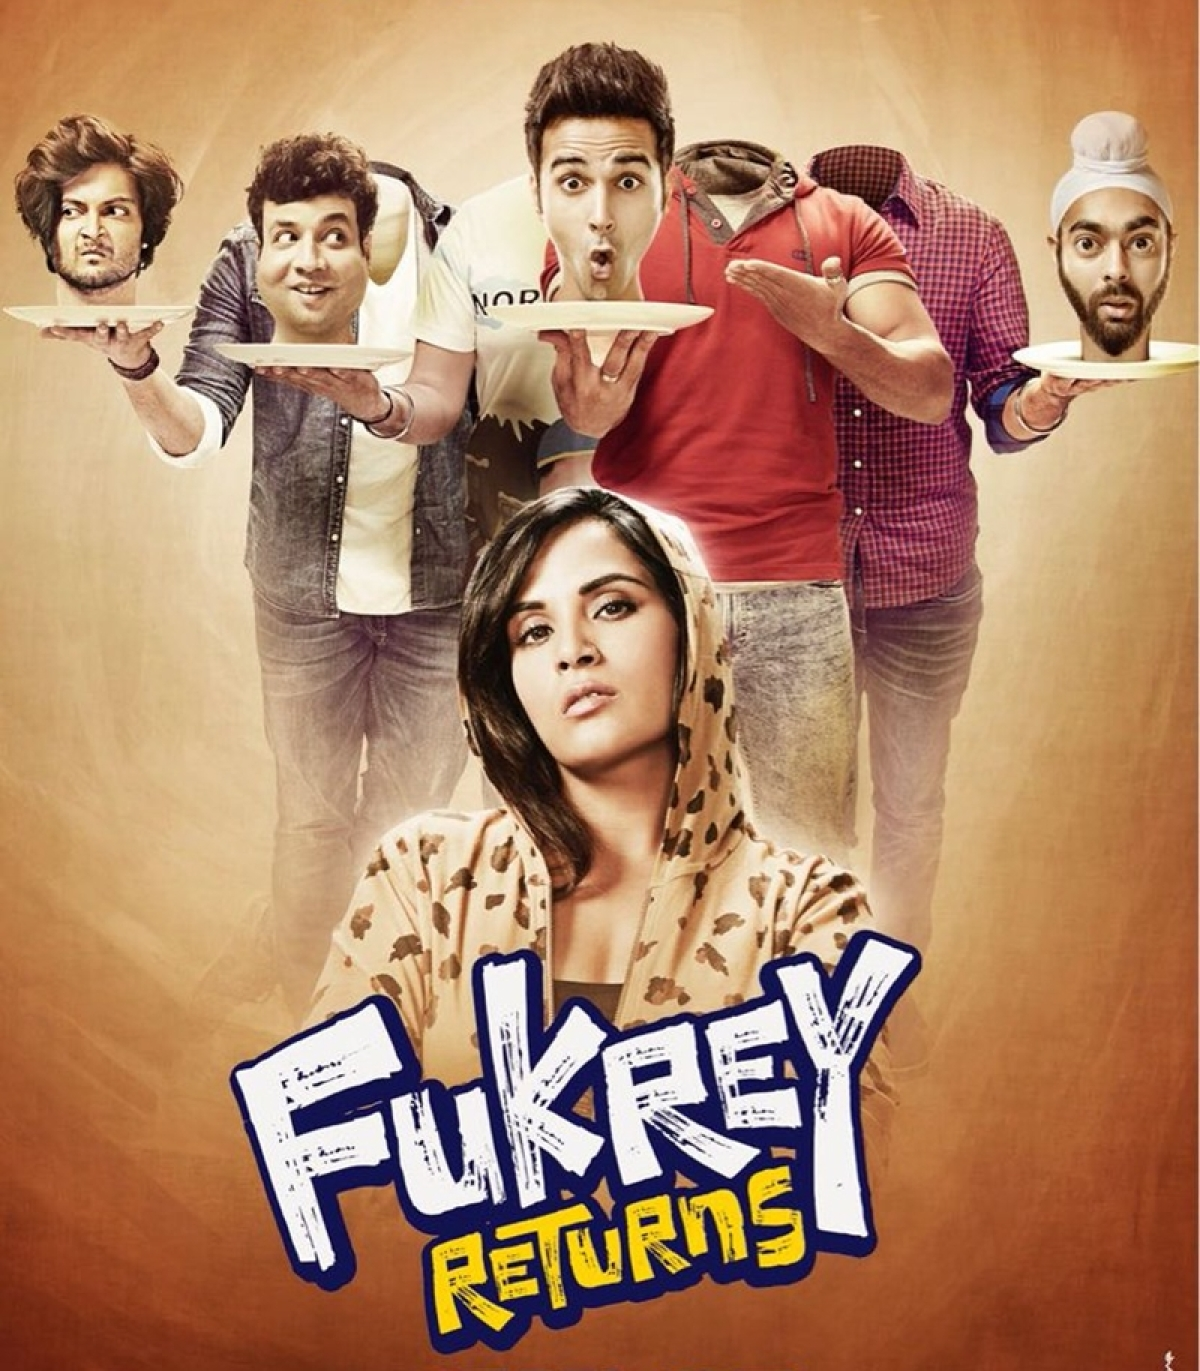 WOW! Fukrey Returns crosses 70 crores at the box office!